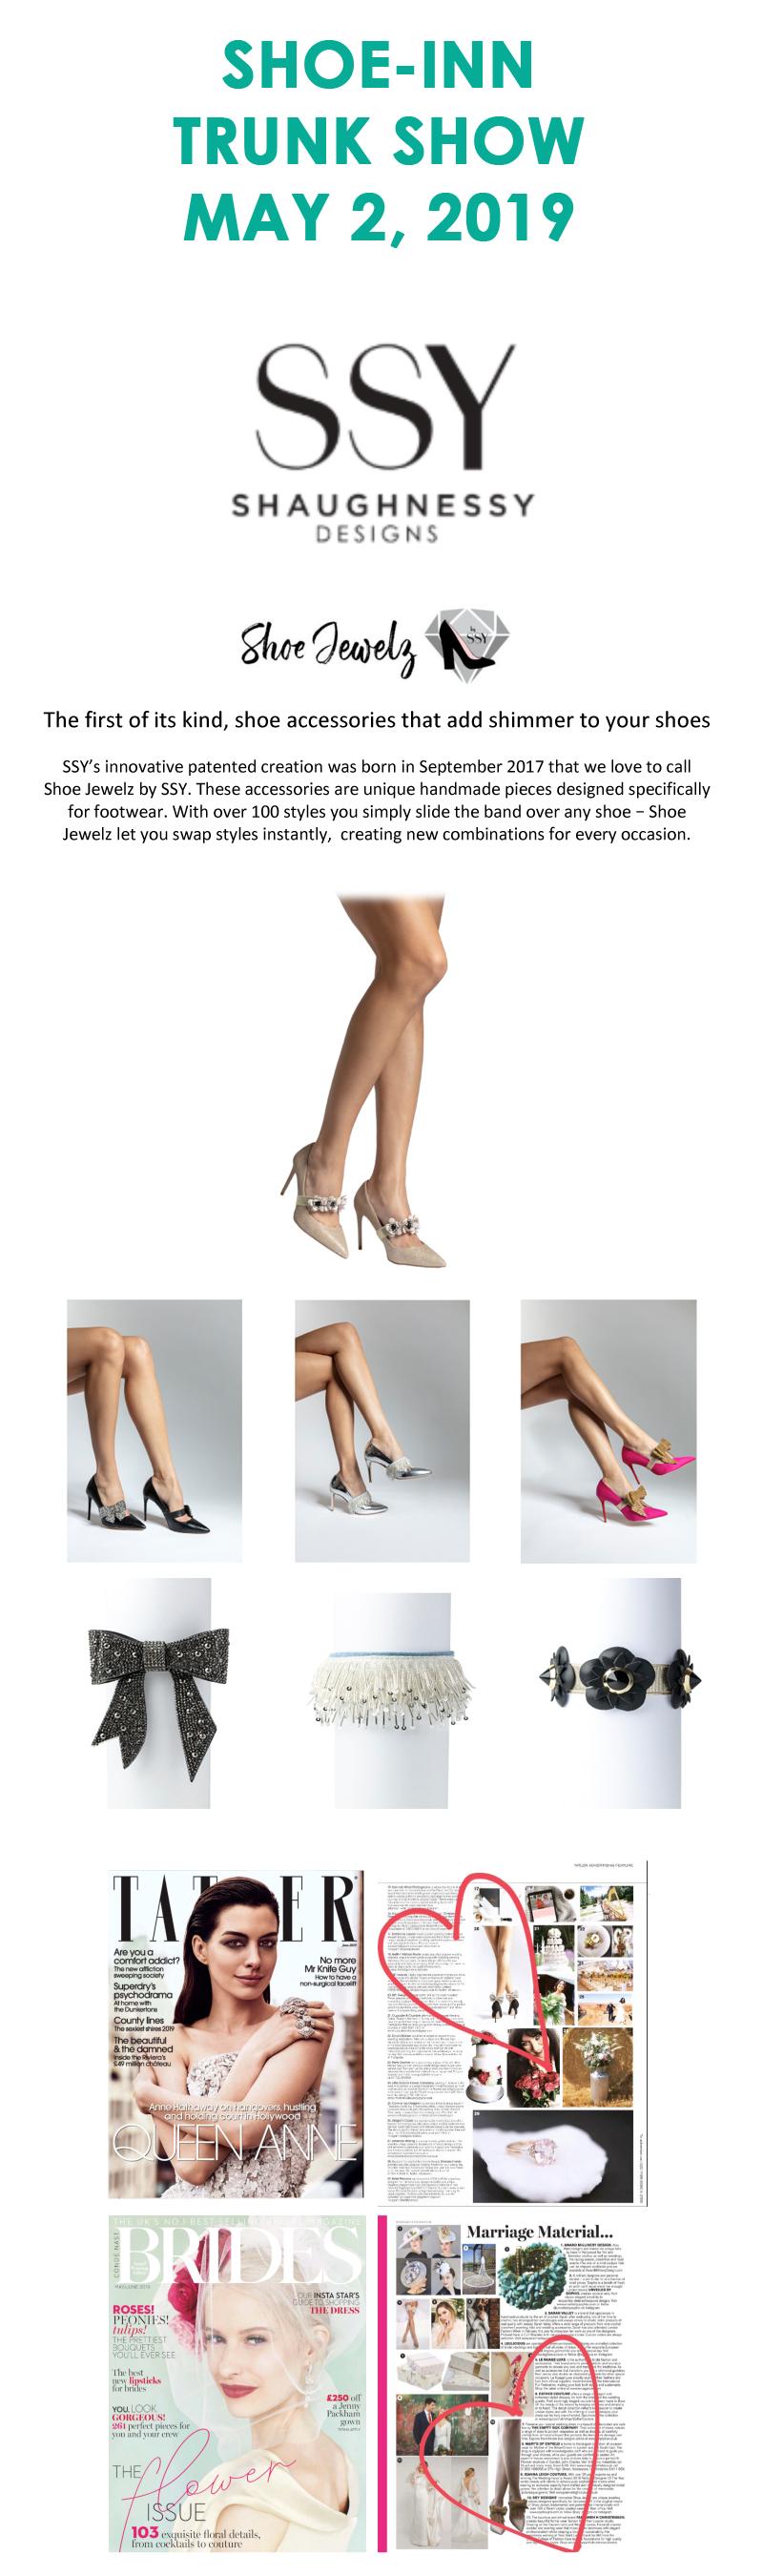 shoe2019trunkshow